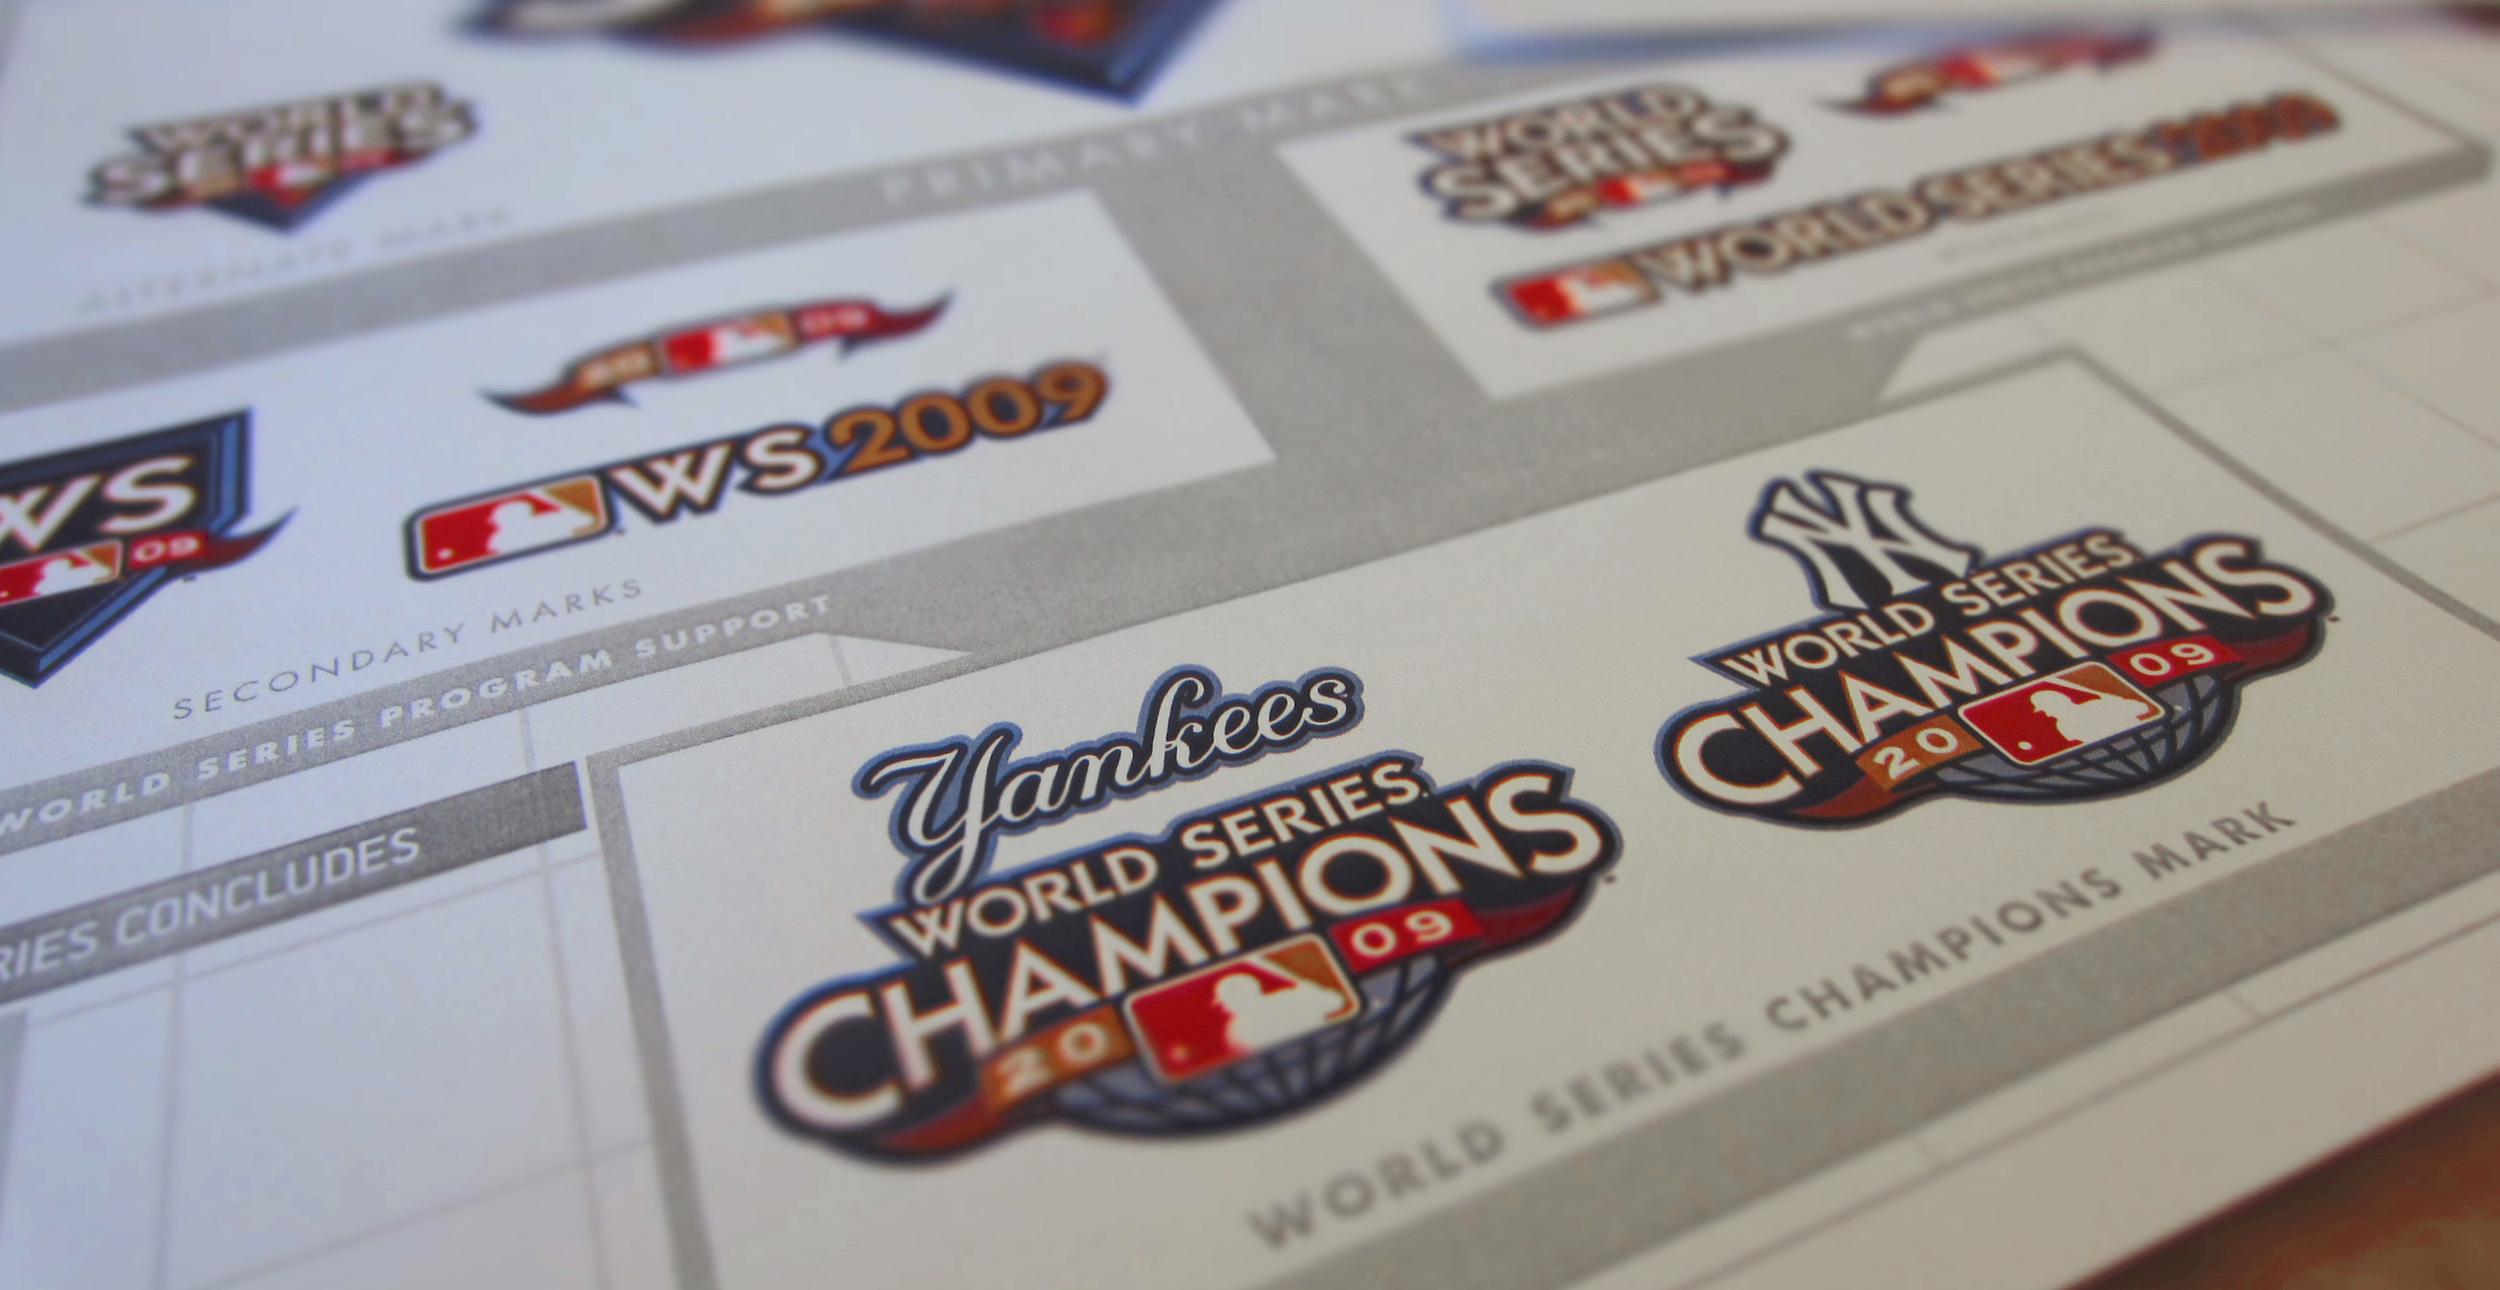 WS2009_Champions_Marks.jpg